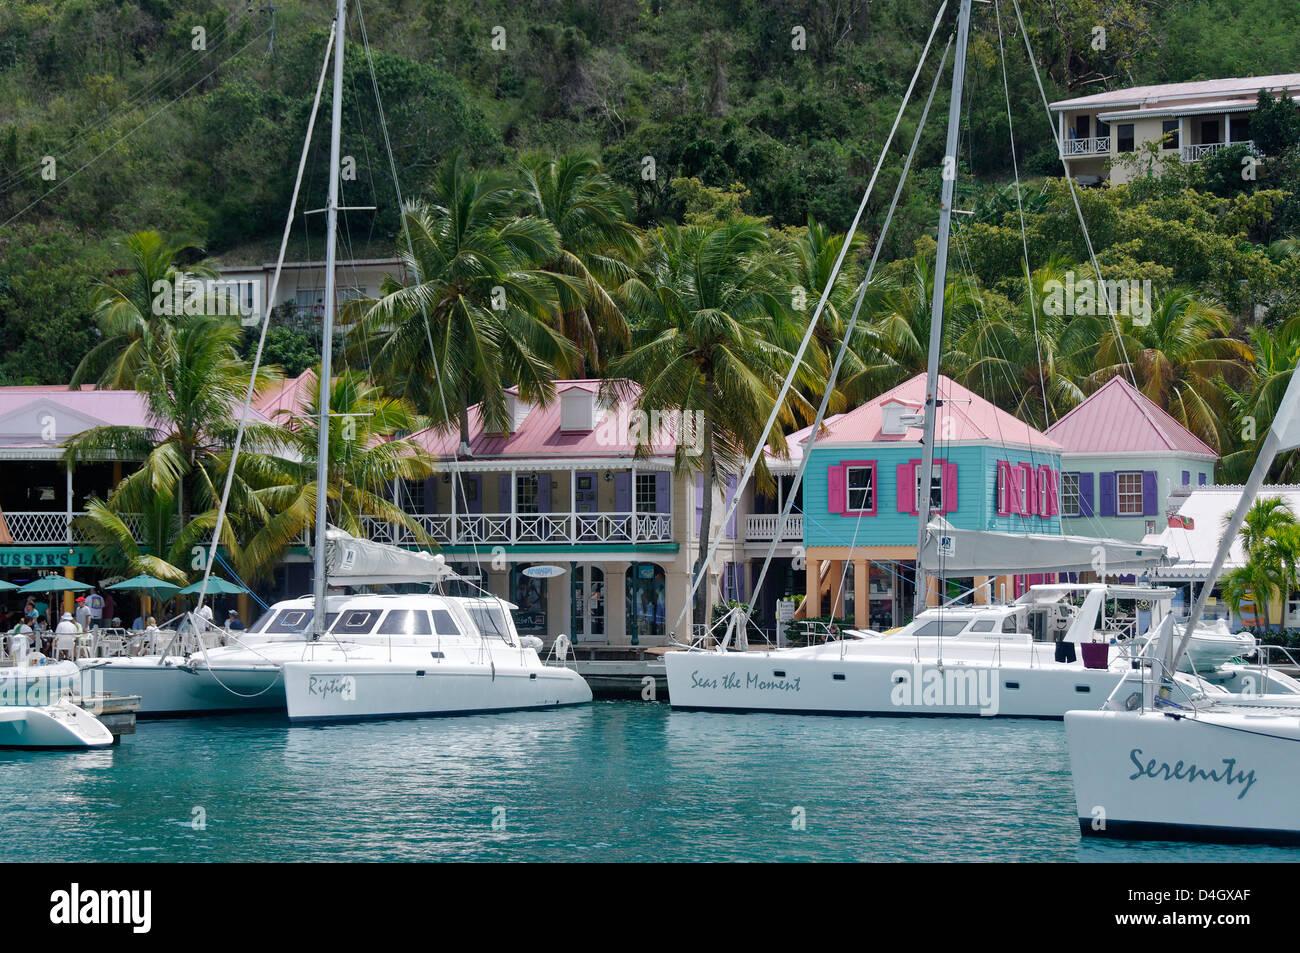 Great Harbour, Jost Van Dyke, the smallest of the four main islands of the British Virgin Islands, West Indies, - Stock Image